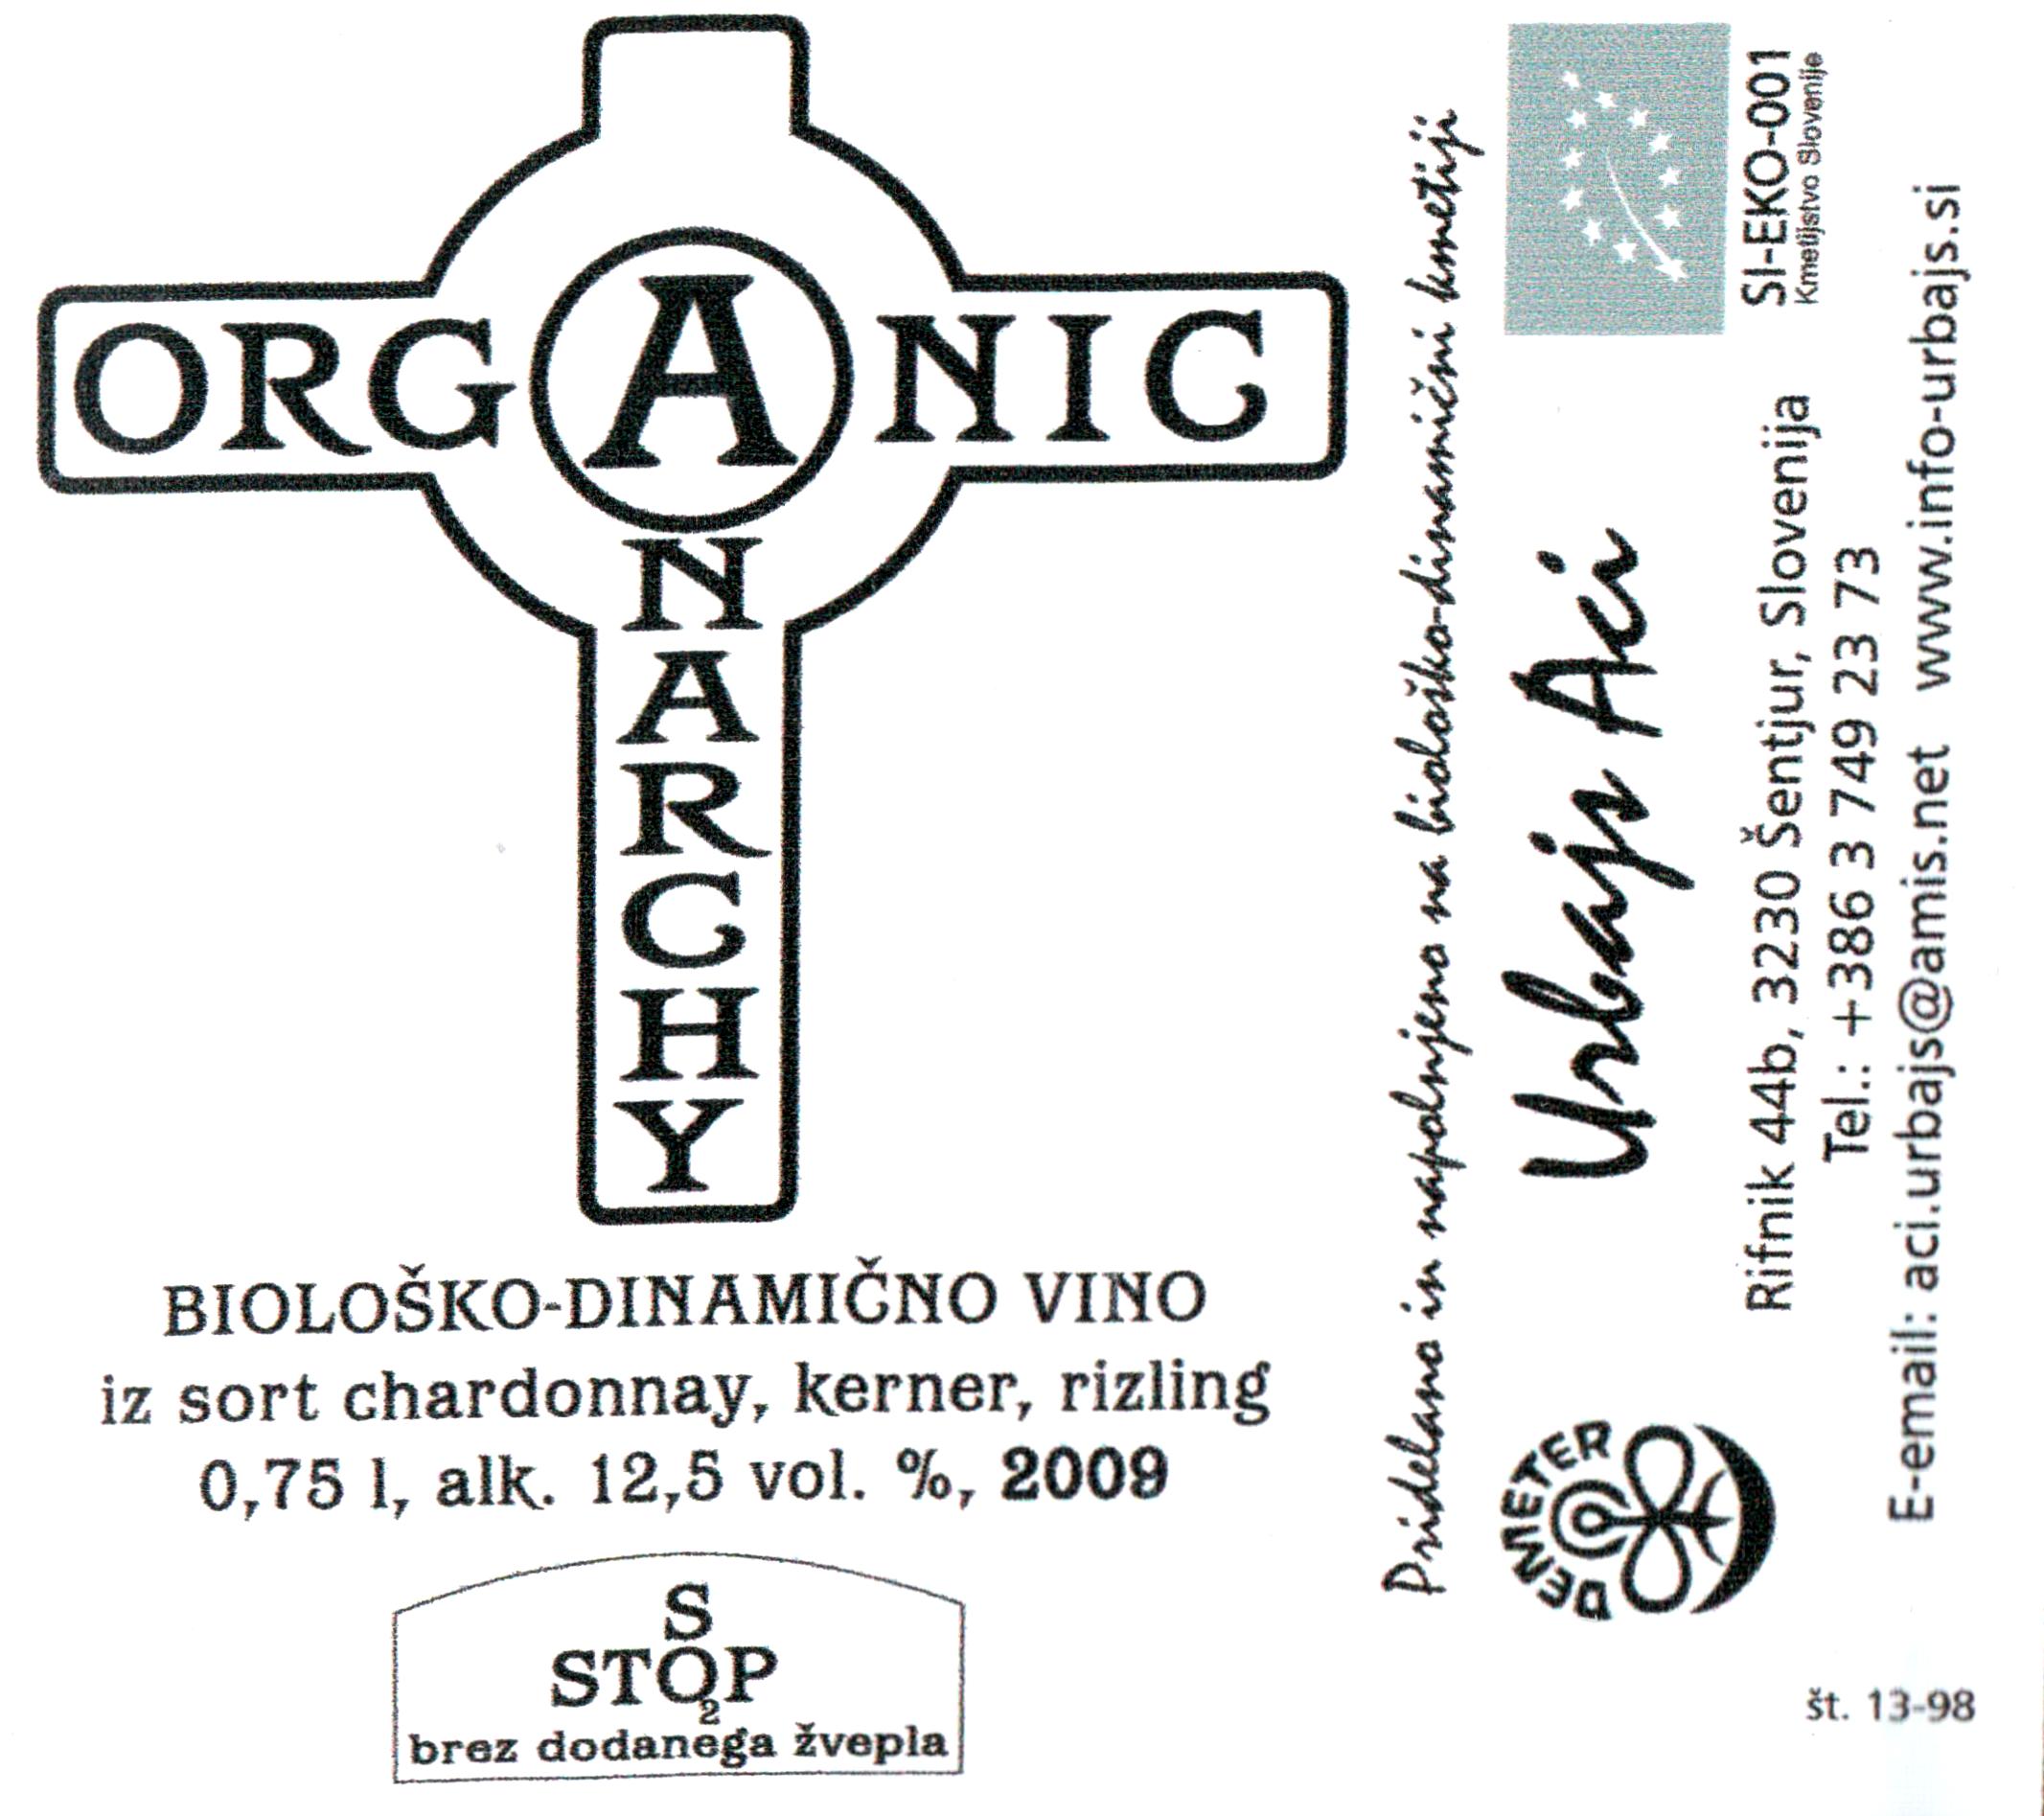 2009 aci urbajs anarchy orange wine wine library iphone label thumb iphone label thumb buycottarizona